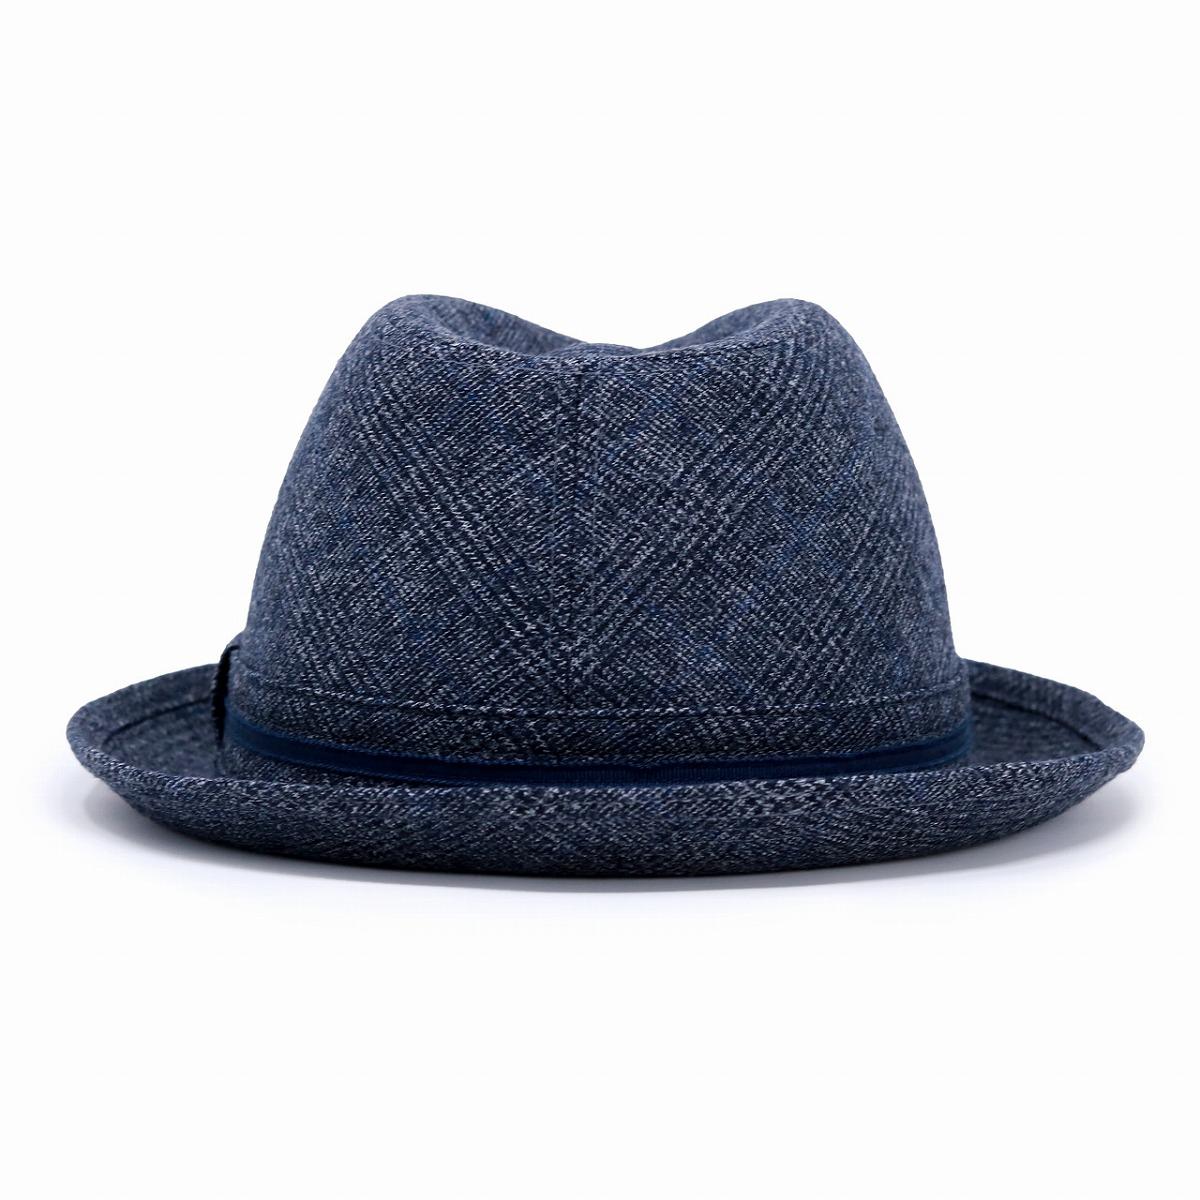 78db2f0232f19 ELEHELM HAT STORE  Dark blue navy  fedora  Respect for the Aged Day ...